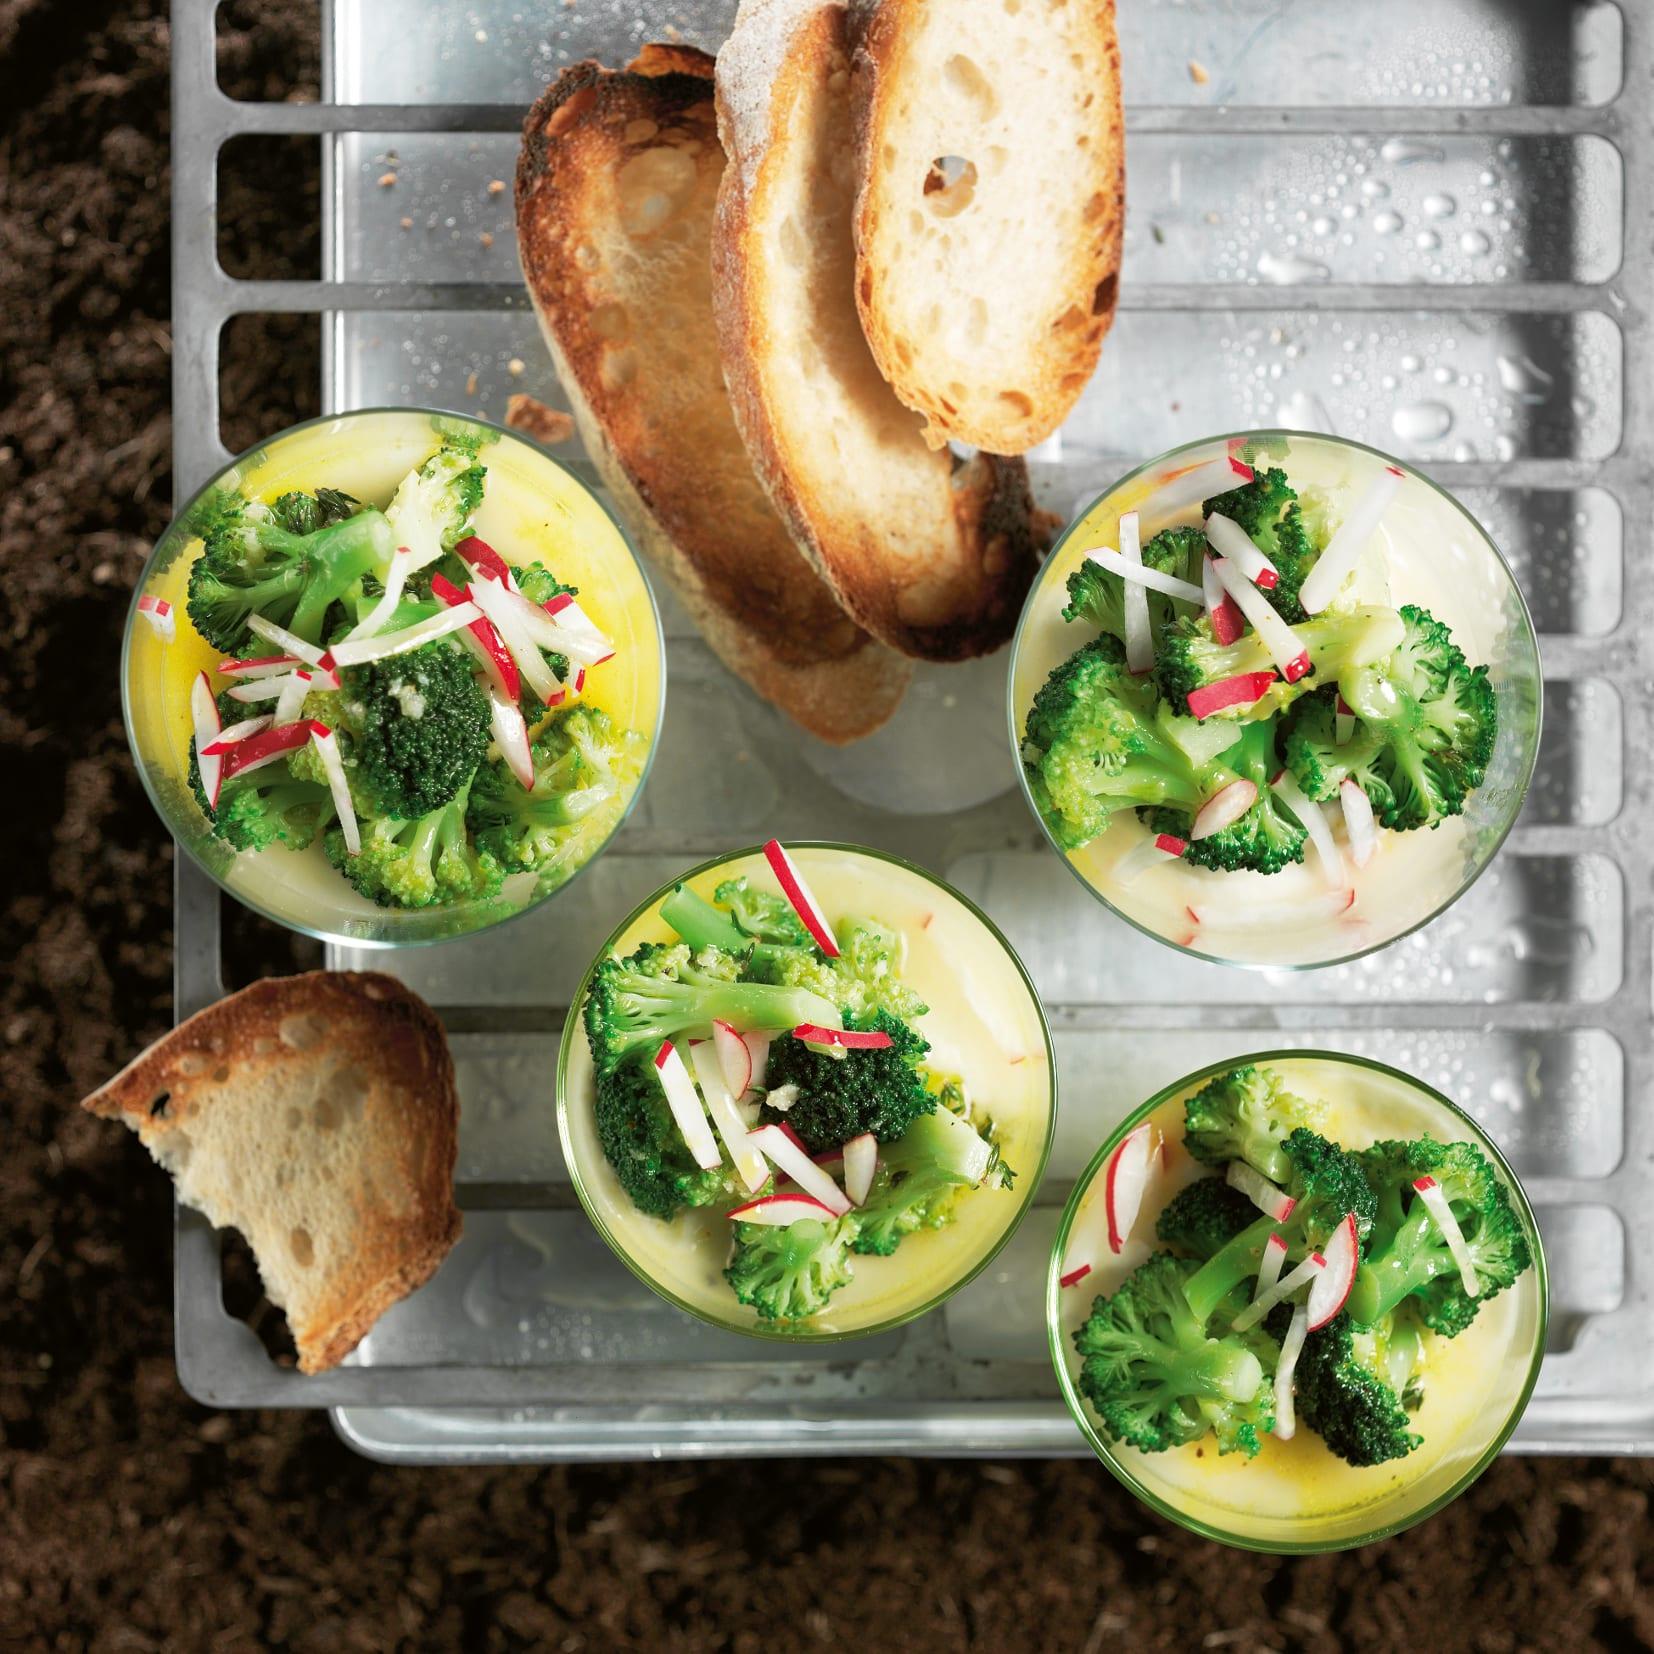 Blumenkohl-Mousse mit Broccolisalat